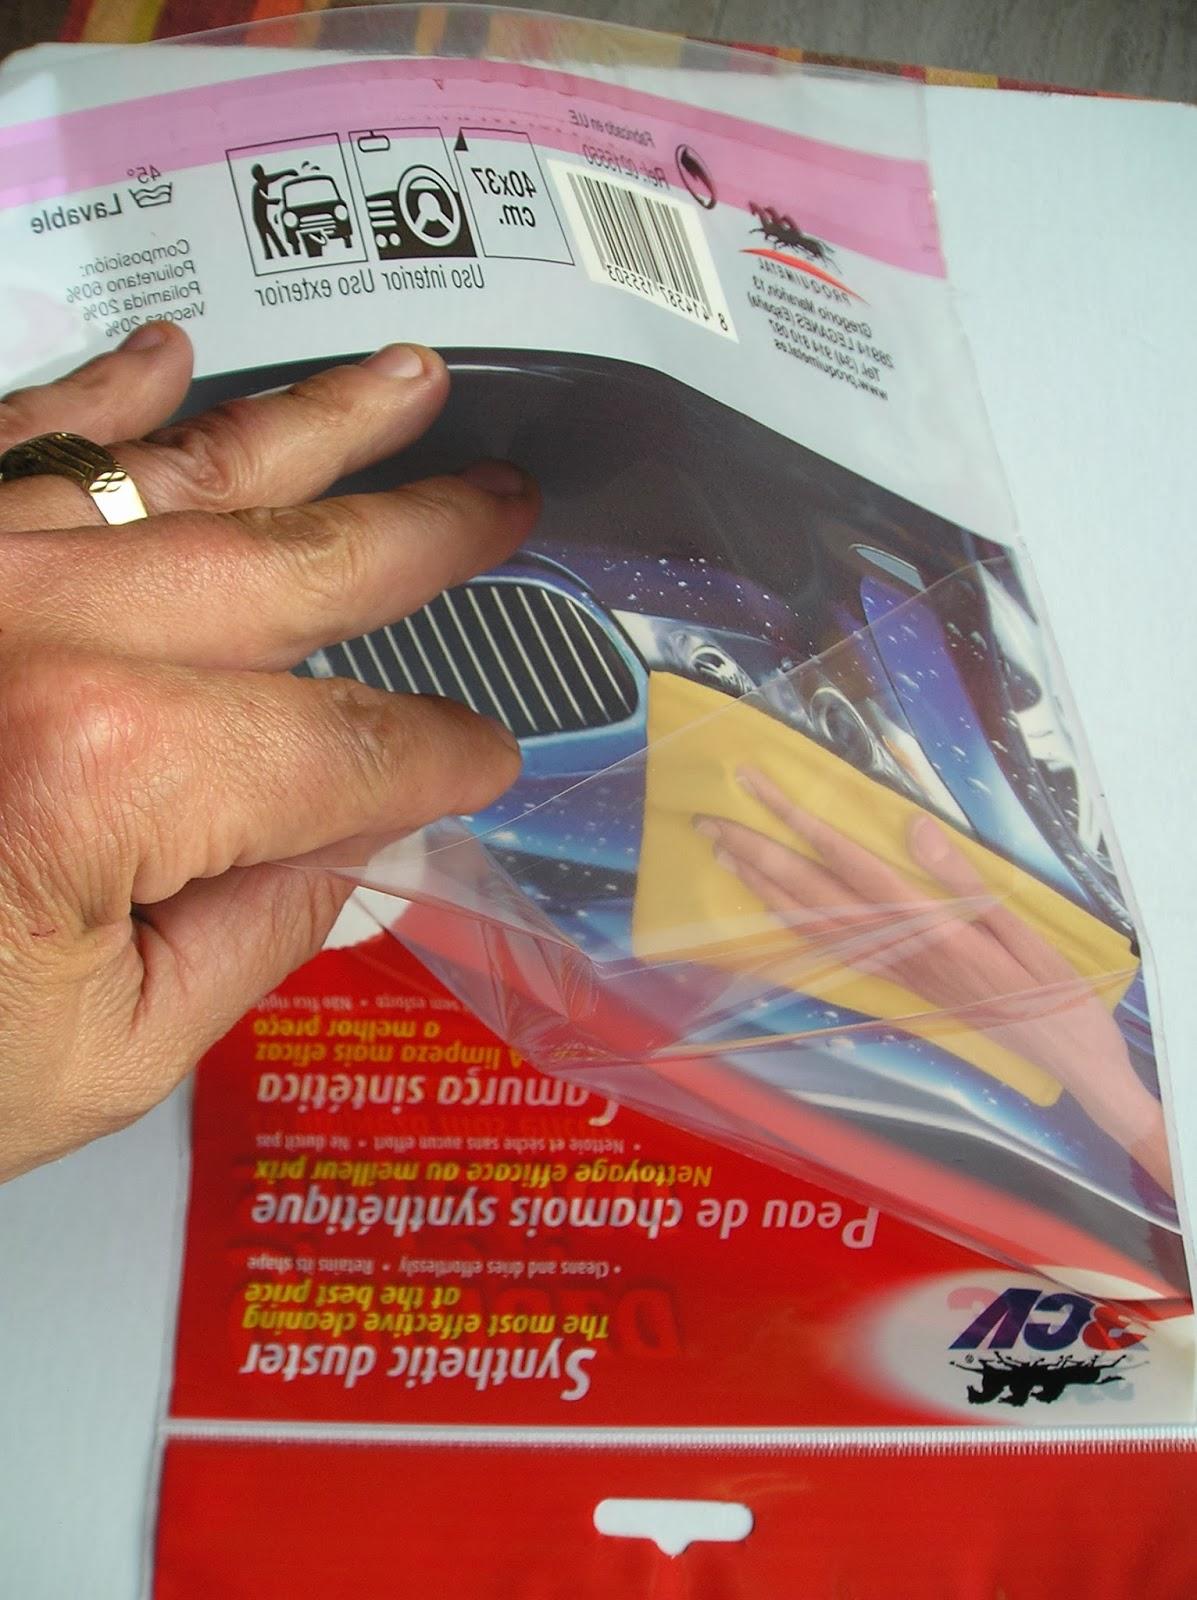 bolsa PP con troquel para colgar + cierre zipper + solapa + tira adhesiva